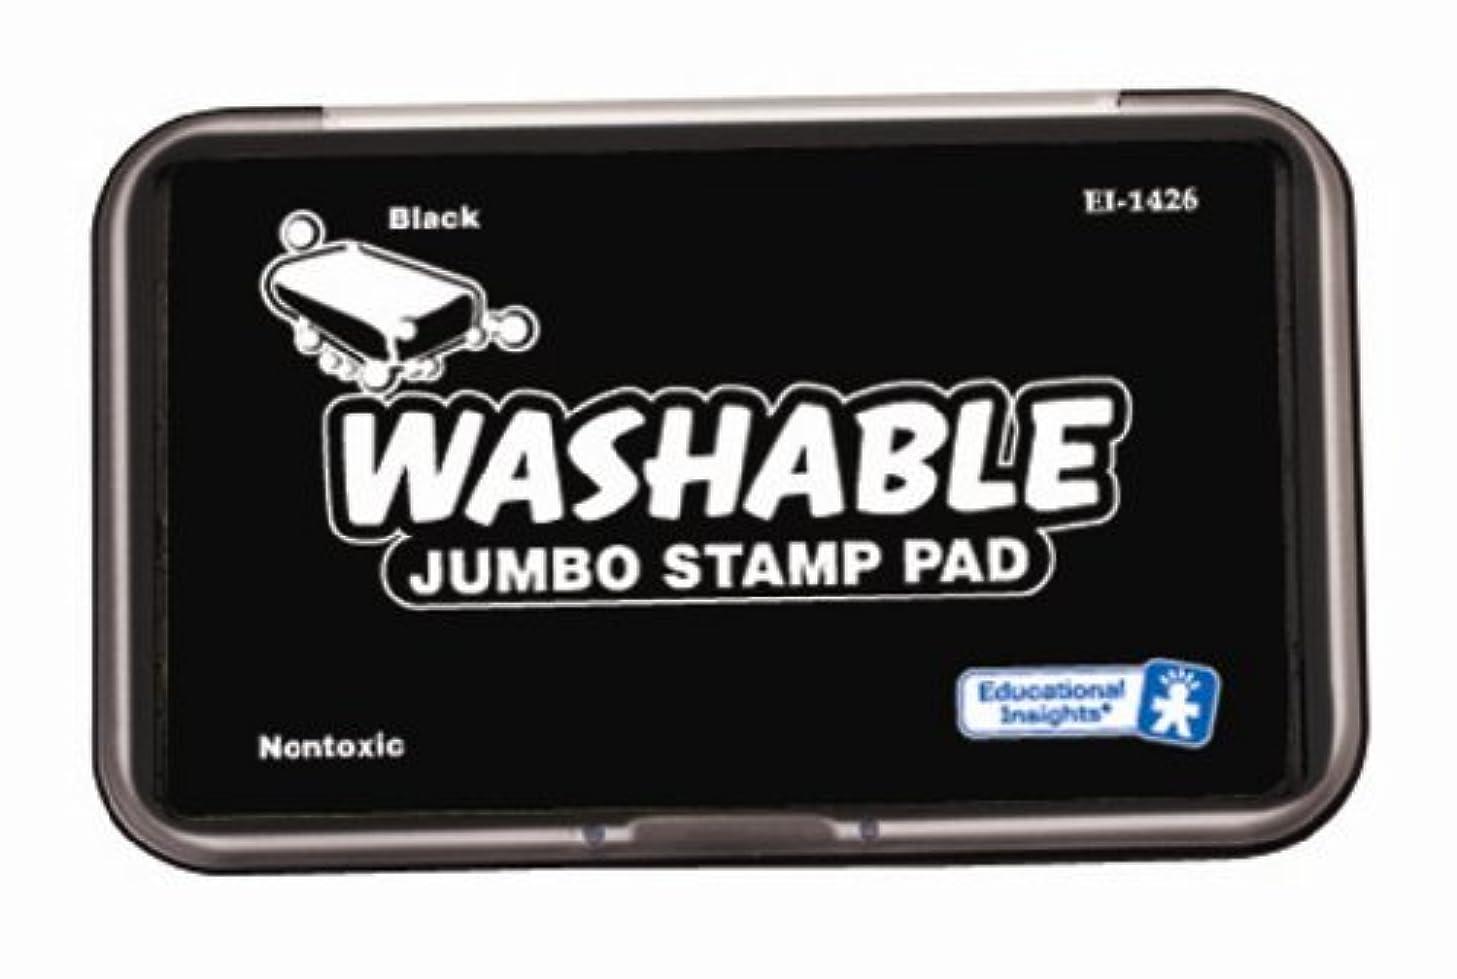 2 X Educational Insights Jumbo Washable Stamp Pad Black